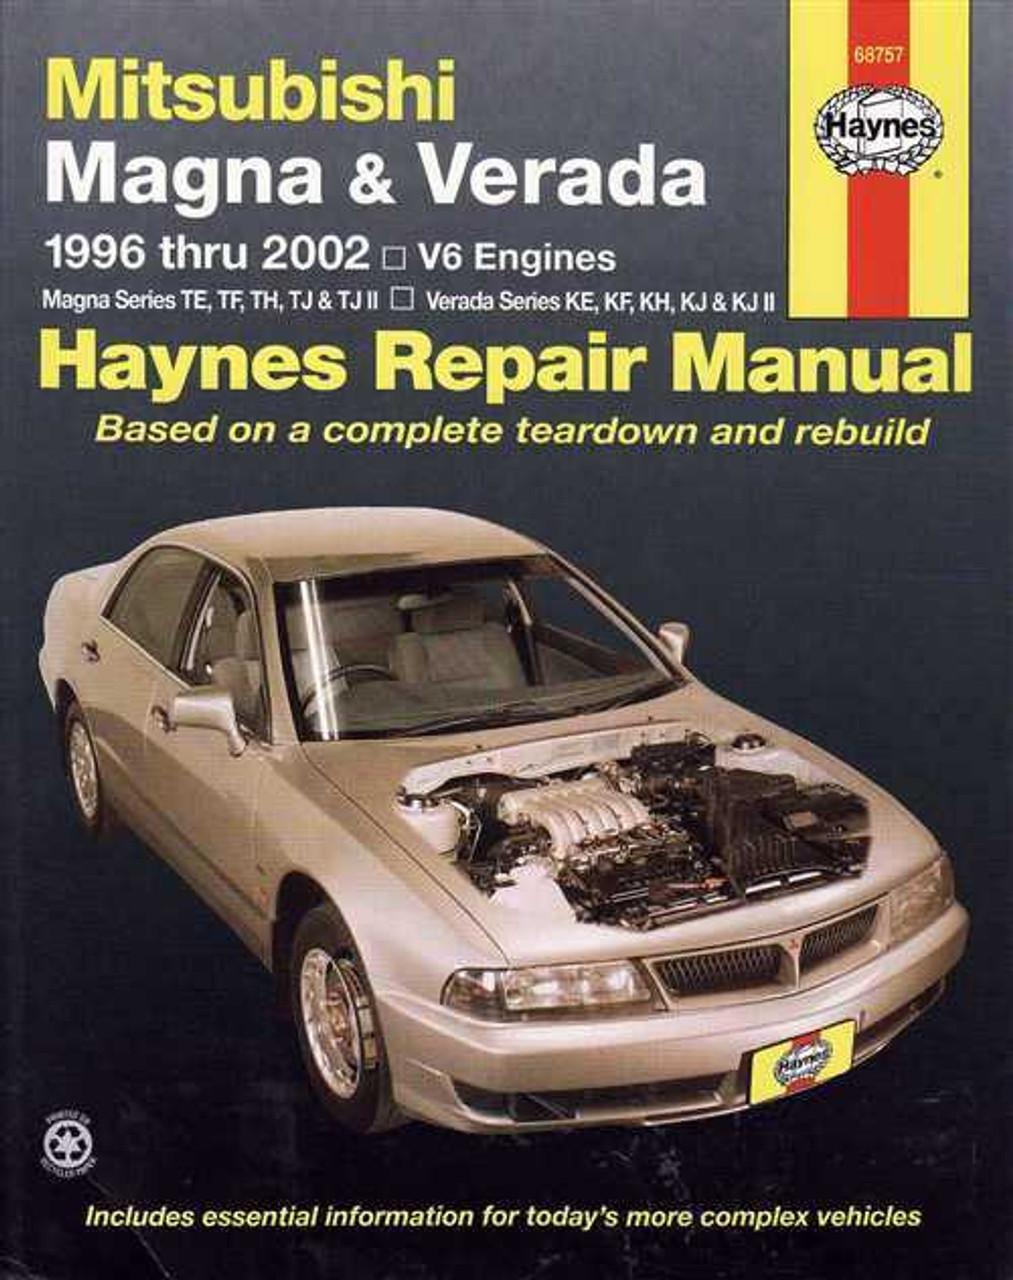 mitsubishi magna amp verada 1996 2002 workshop manual rh automotobookshop com au Mitsubishi Magna 2002 Mitsubishi Magna 4WD